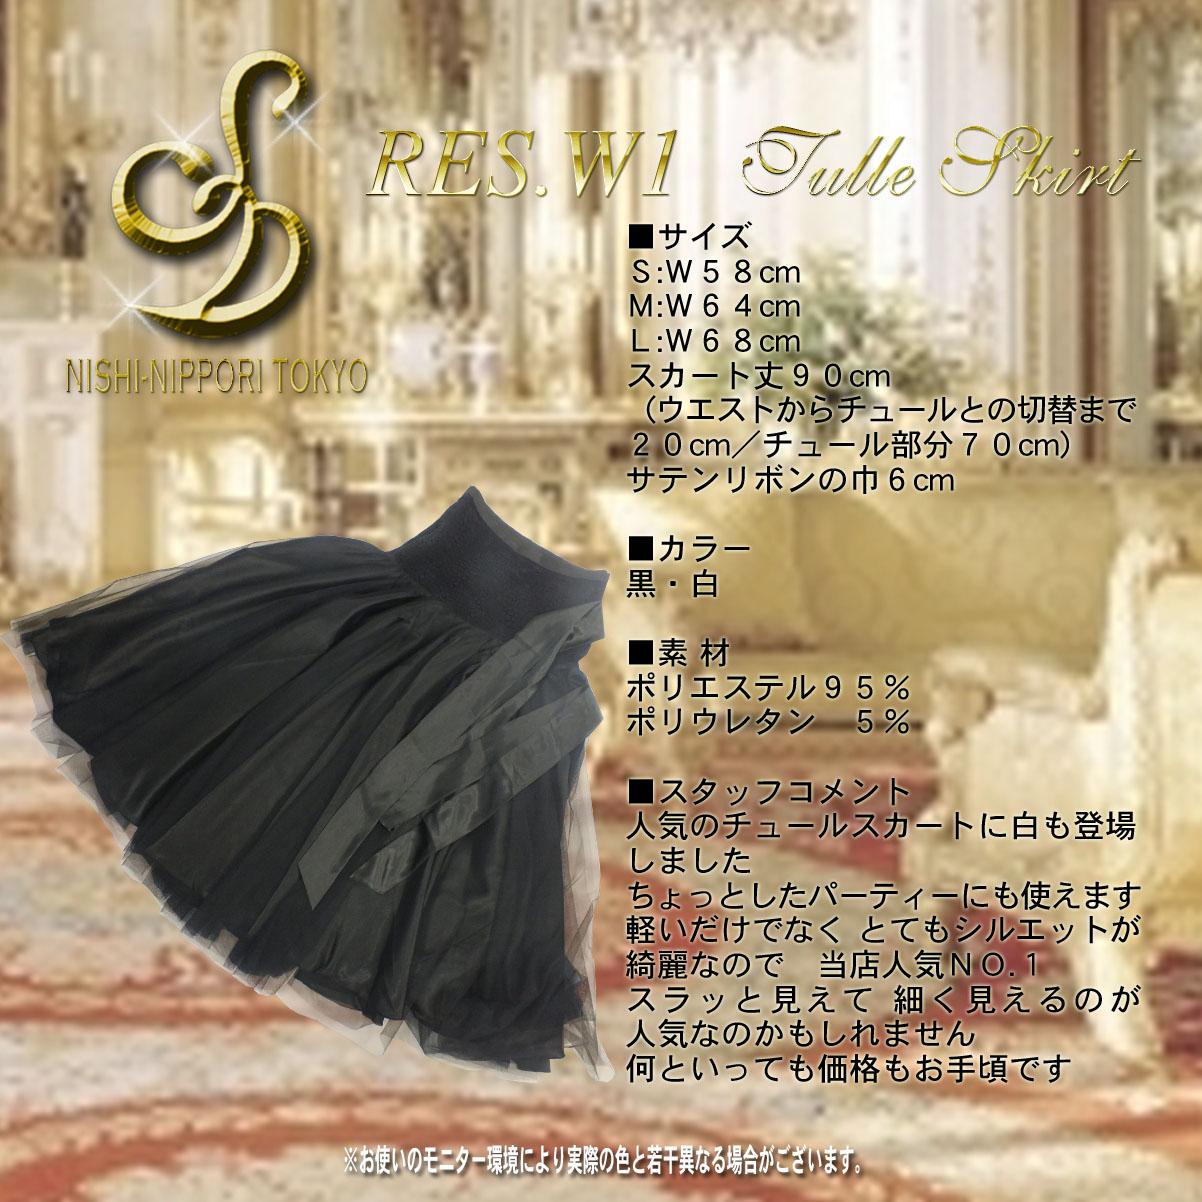 RES.W1 チュールスカート